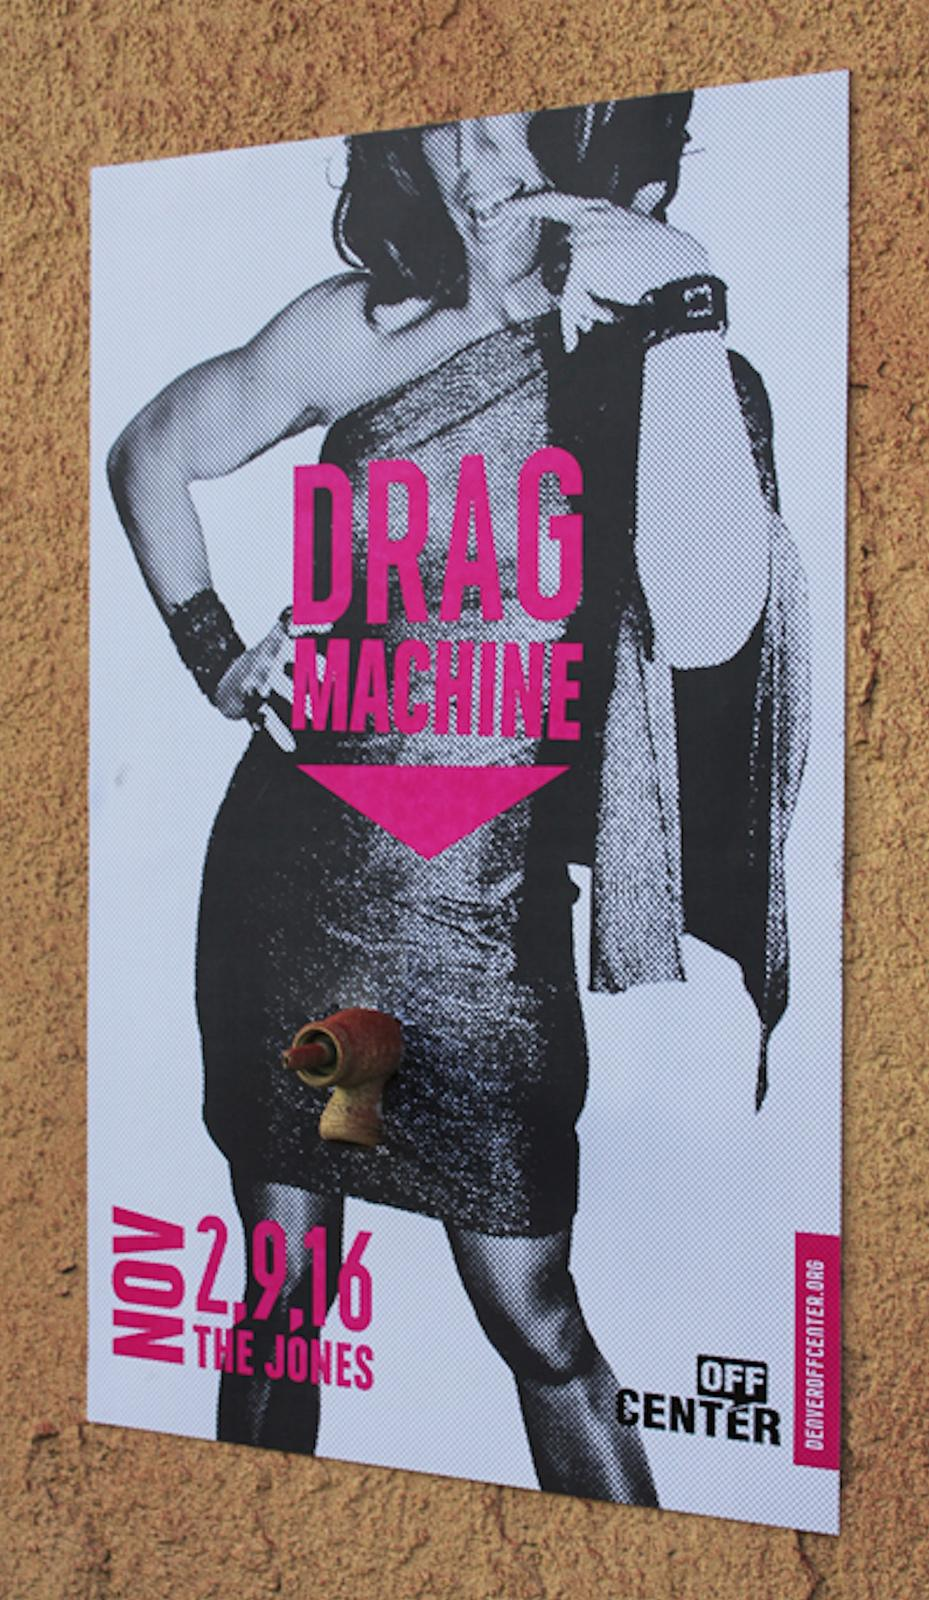 Off-Center Outdoor Ad -  Drag Machine, 2